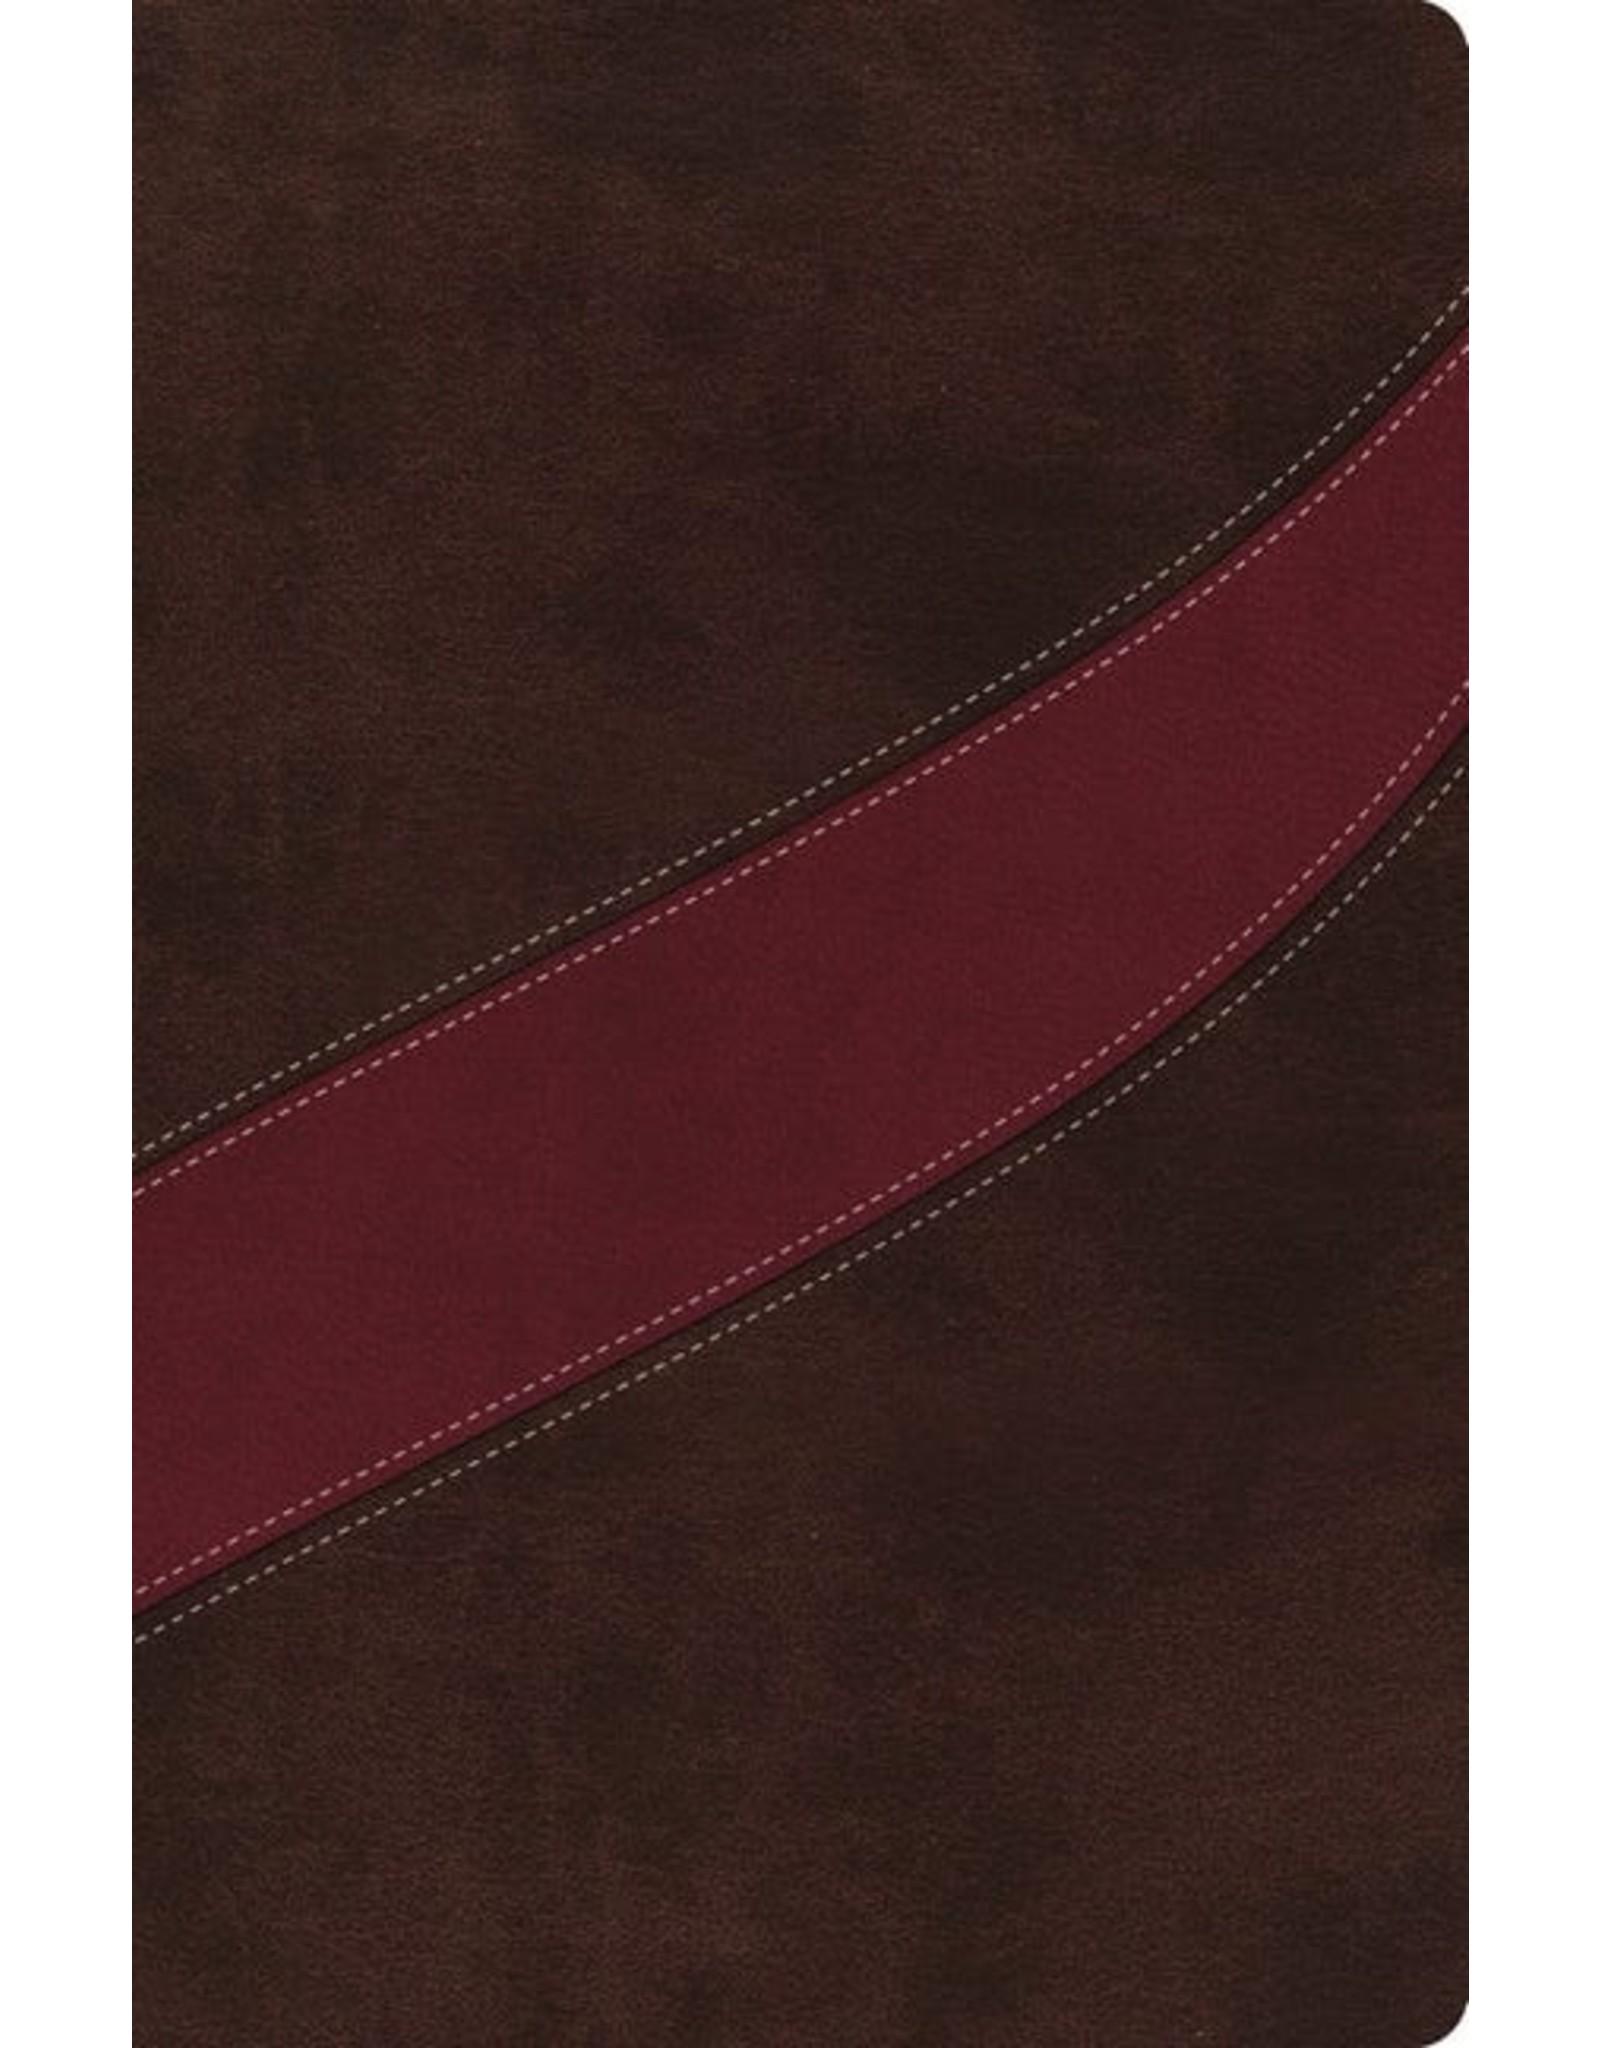 Harper Collins / Thomas Nelson / Zondervan MacArthur Study Bible: NASB Cranberry/Brown, Leathersoft